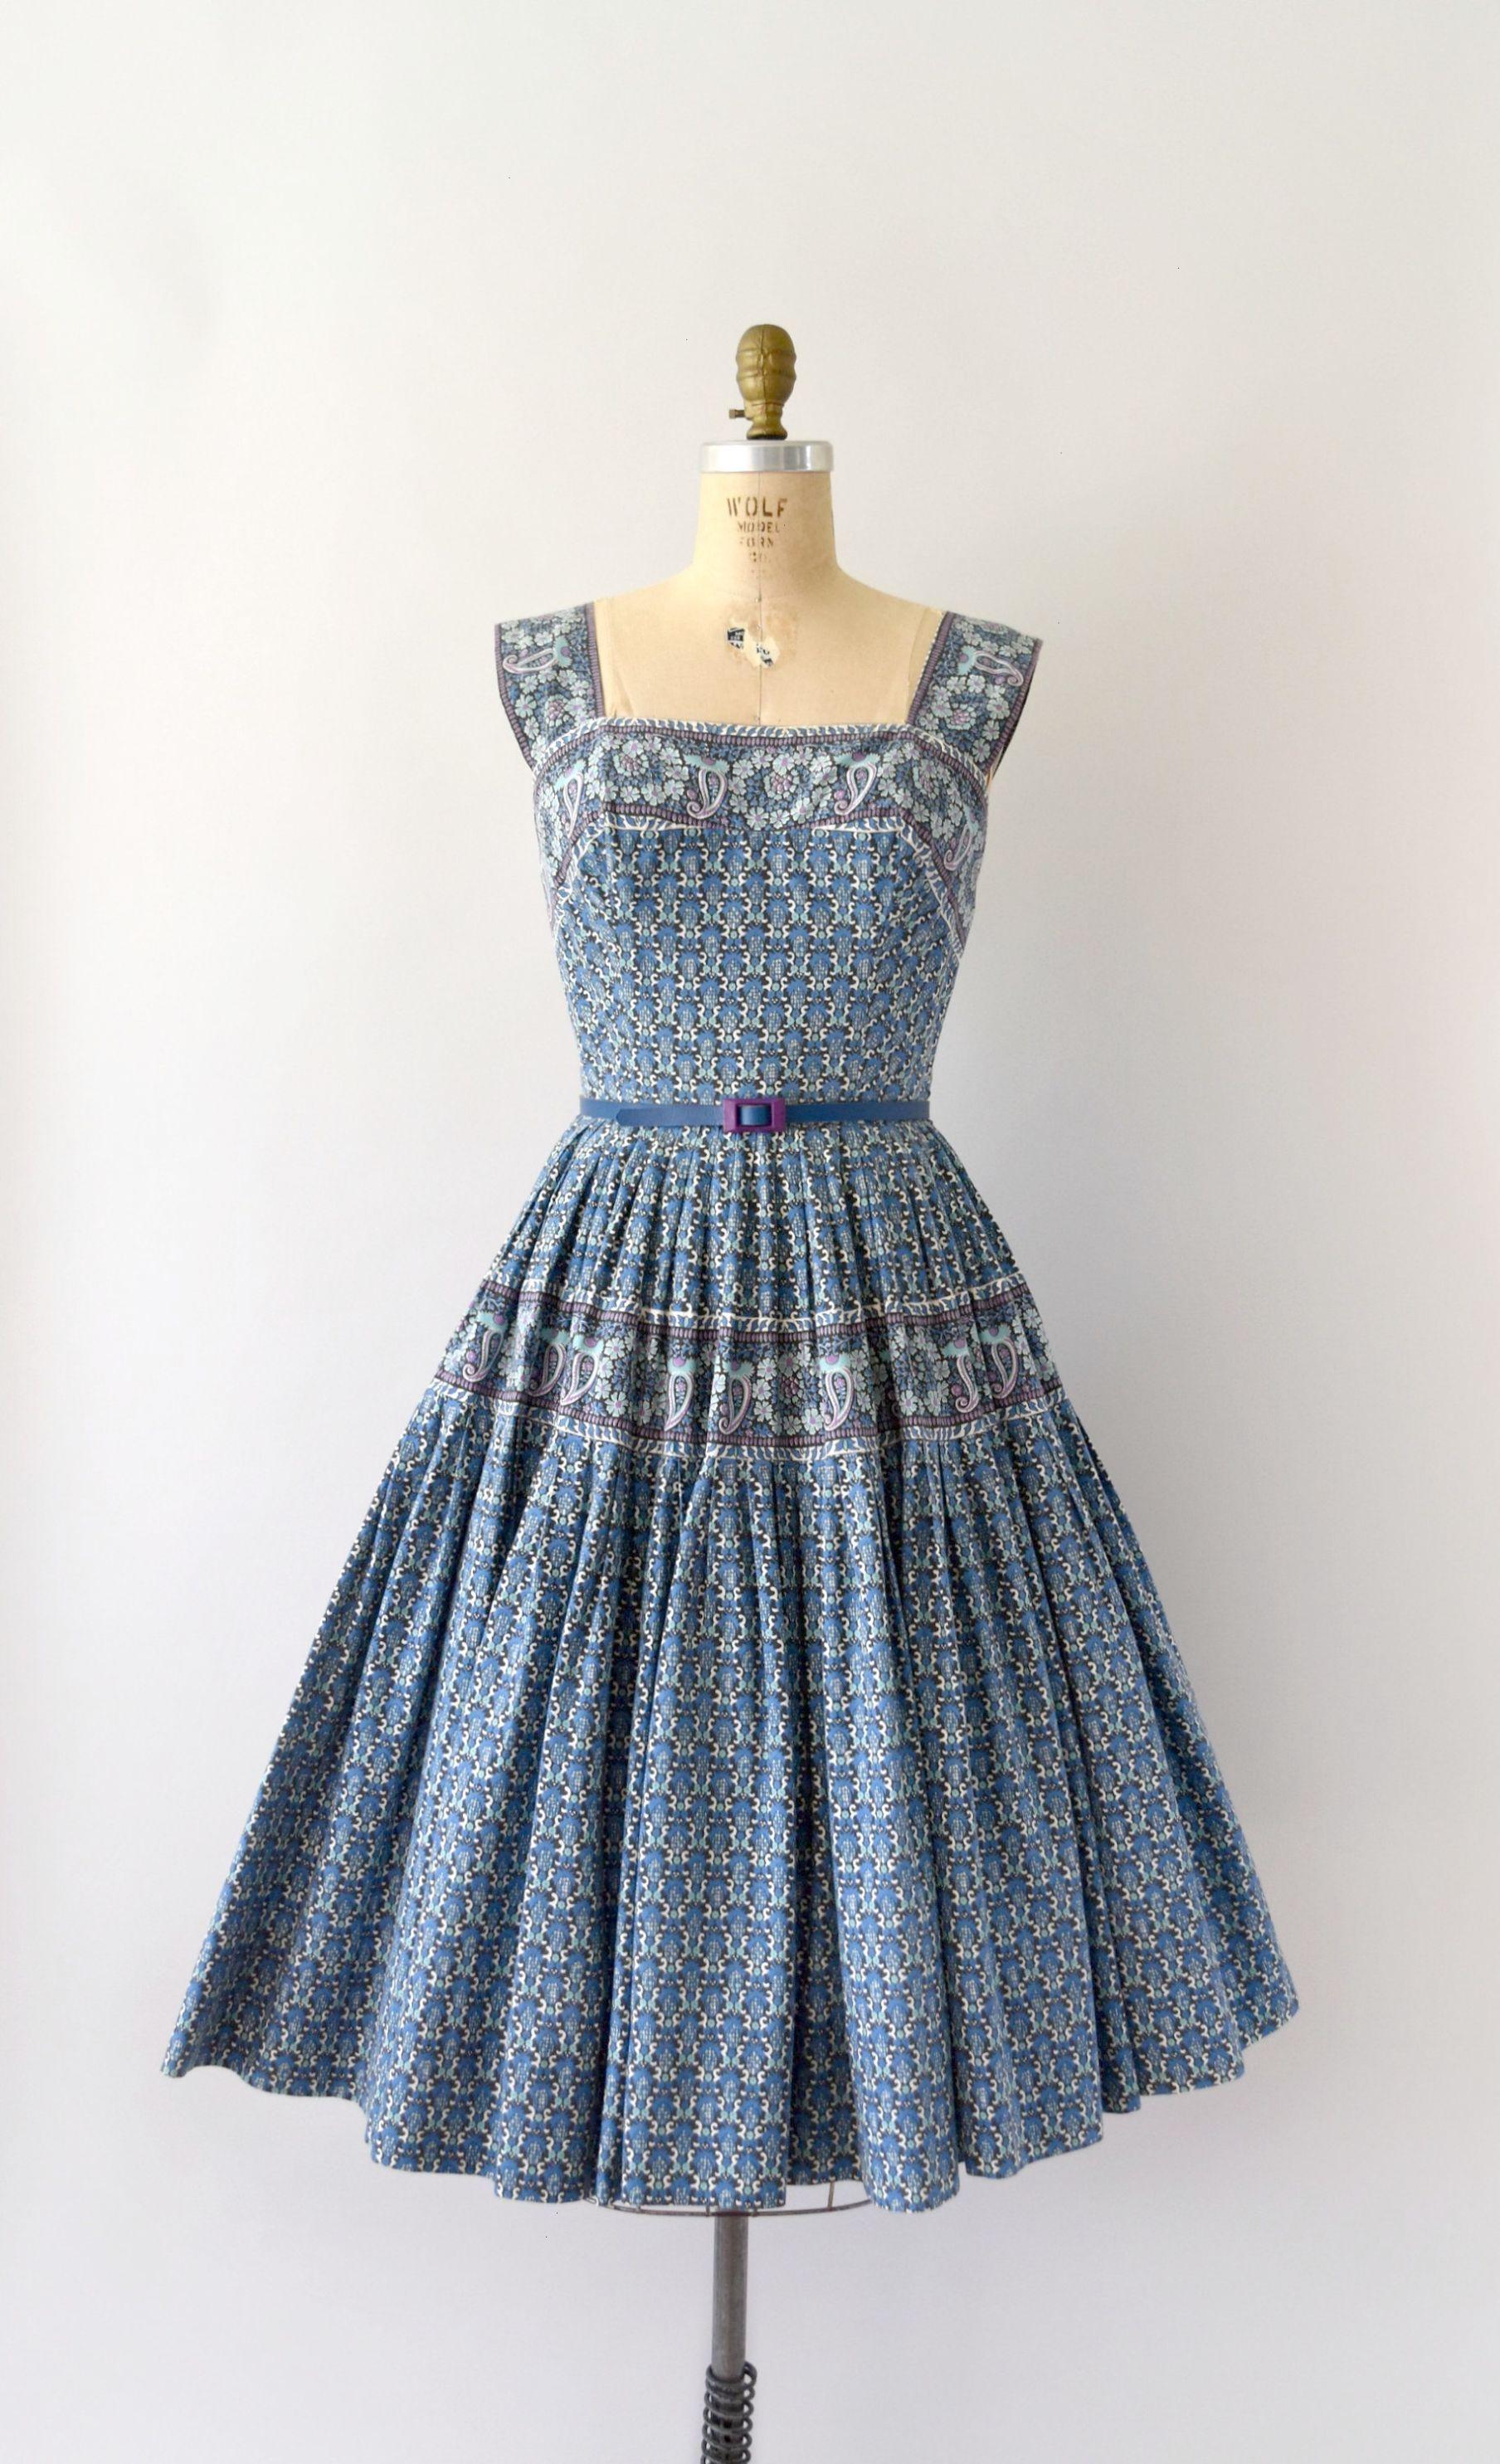 S vintage dress s carolyn schnurer sundress blue owlladys